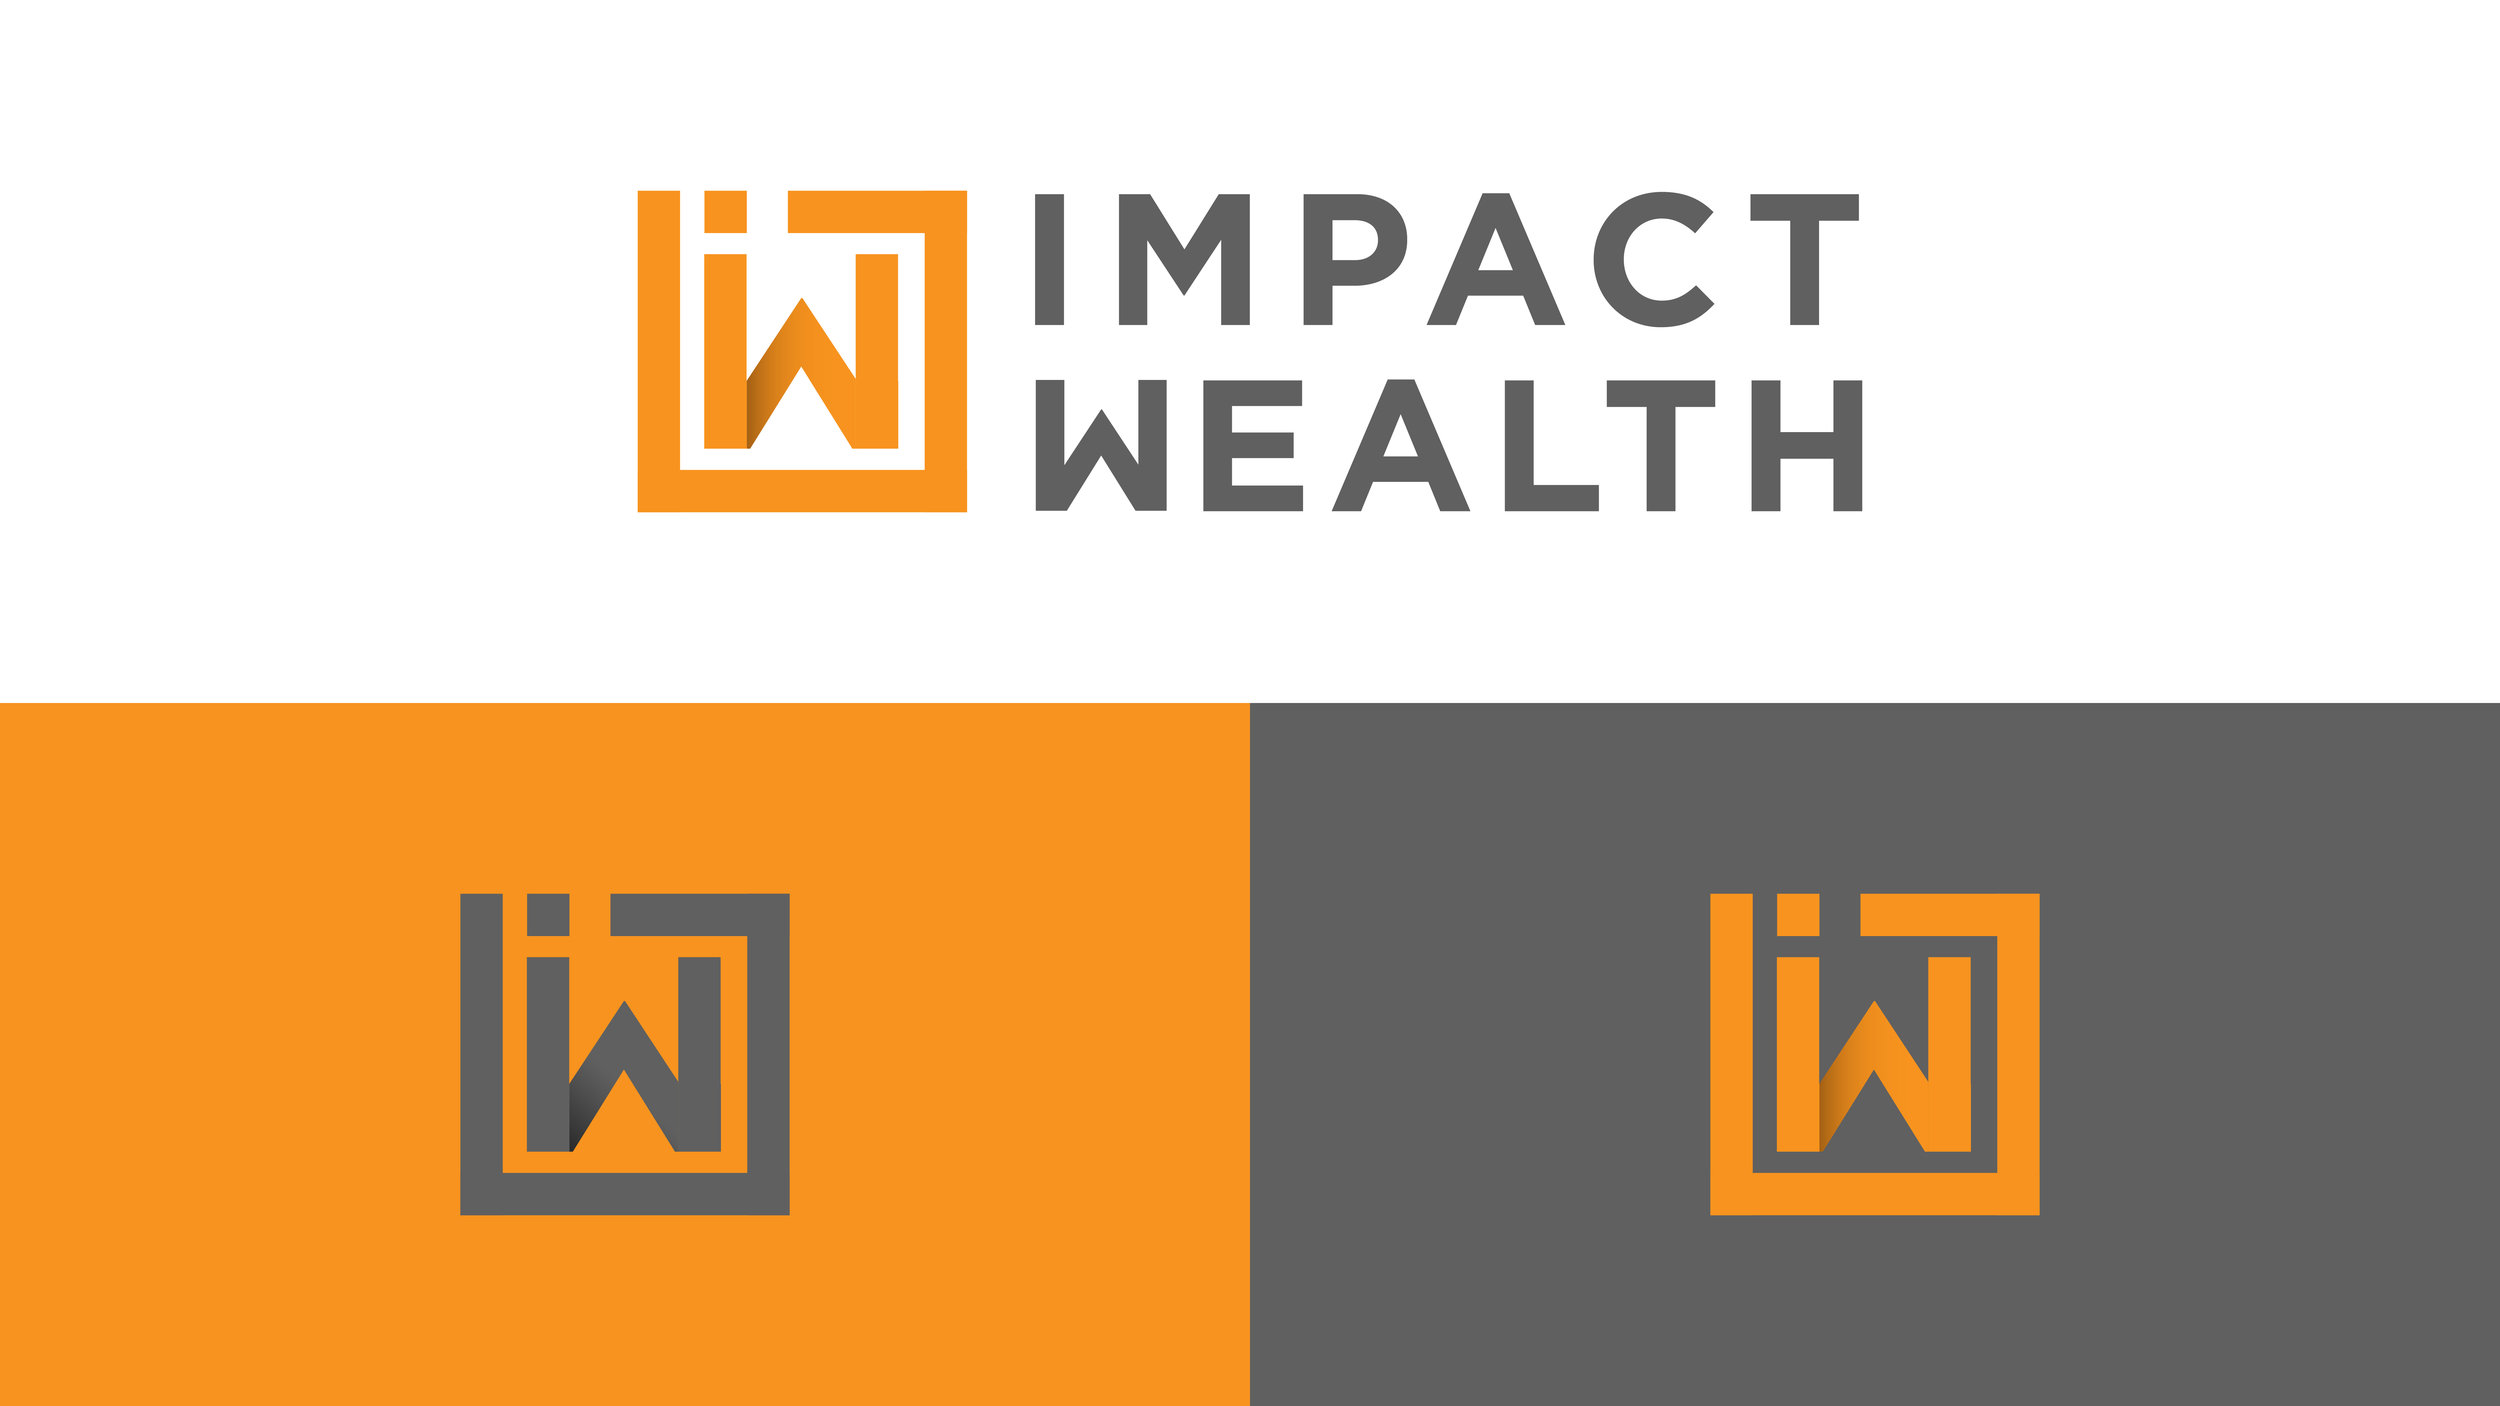 Impact Welath Porfolio Outline [Recovered]-01.jpg